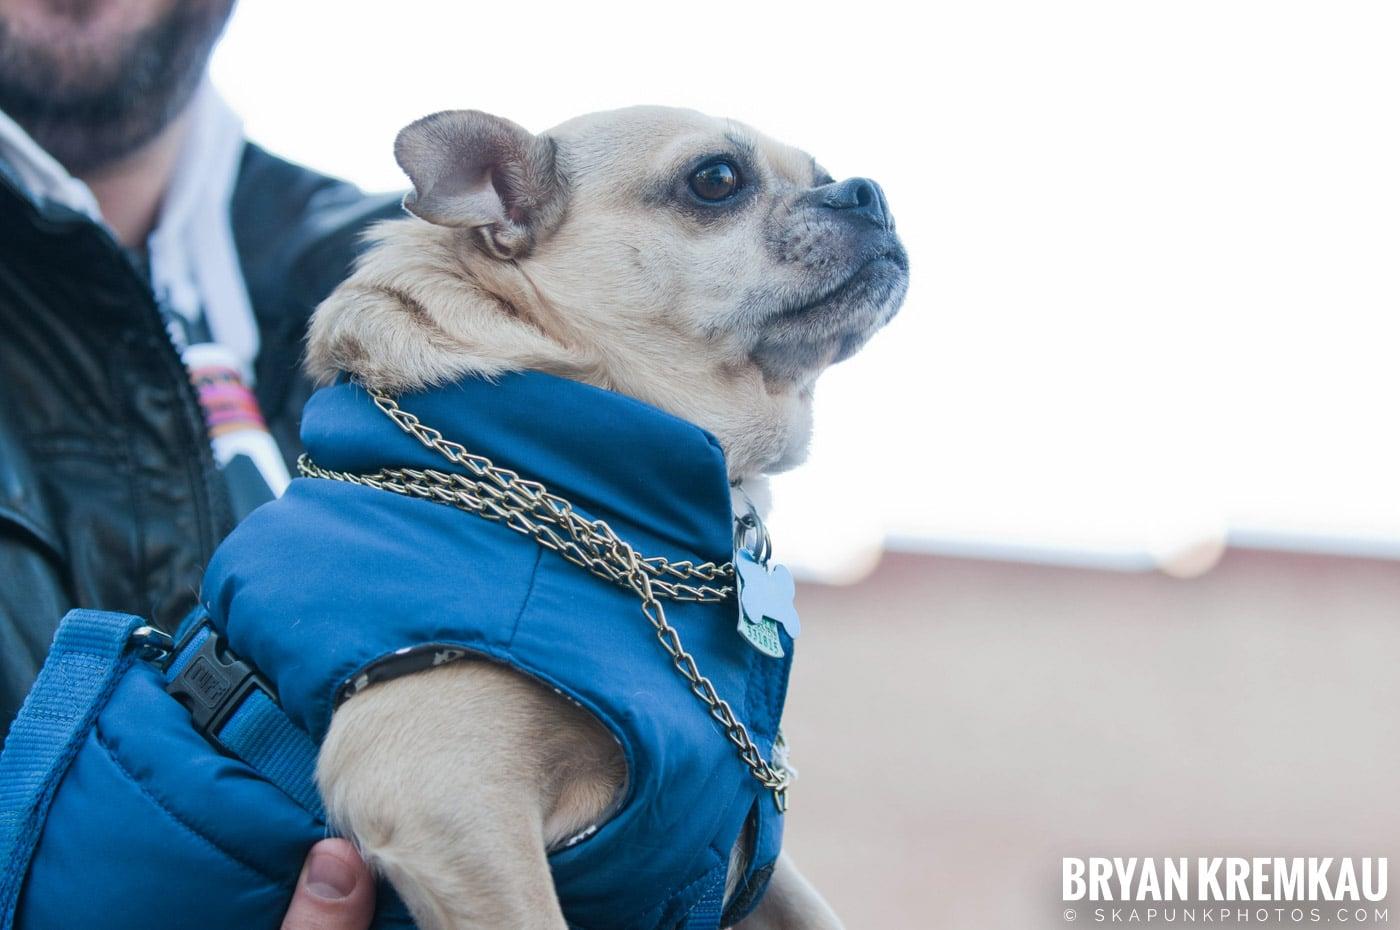 Paulus Hook Halloween Pet Parade 2011 @ Jersey City, NJ - 10.30.11 (42)